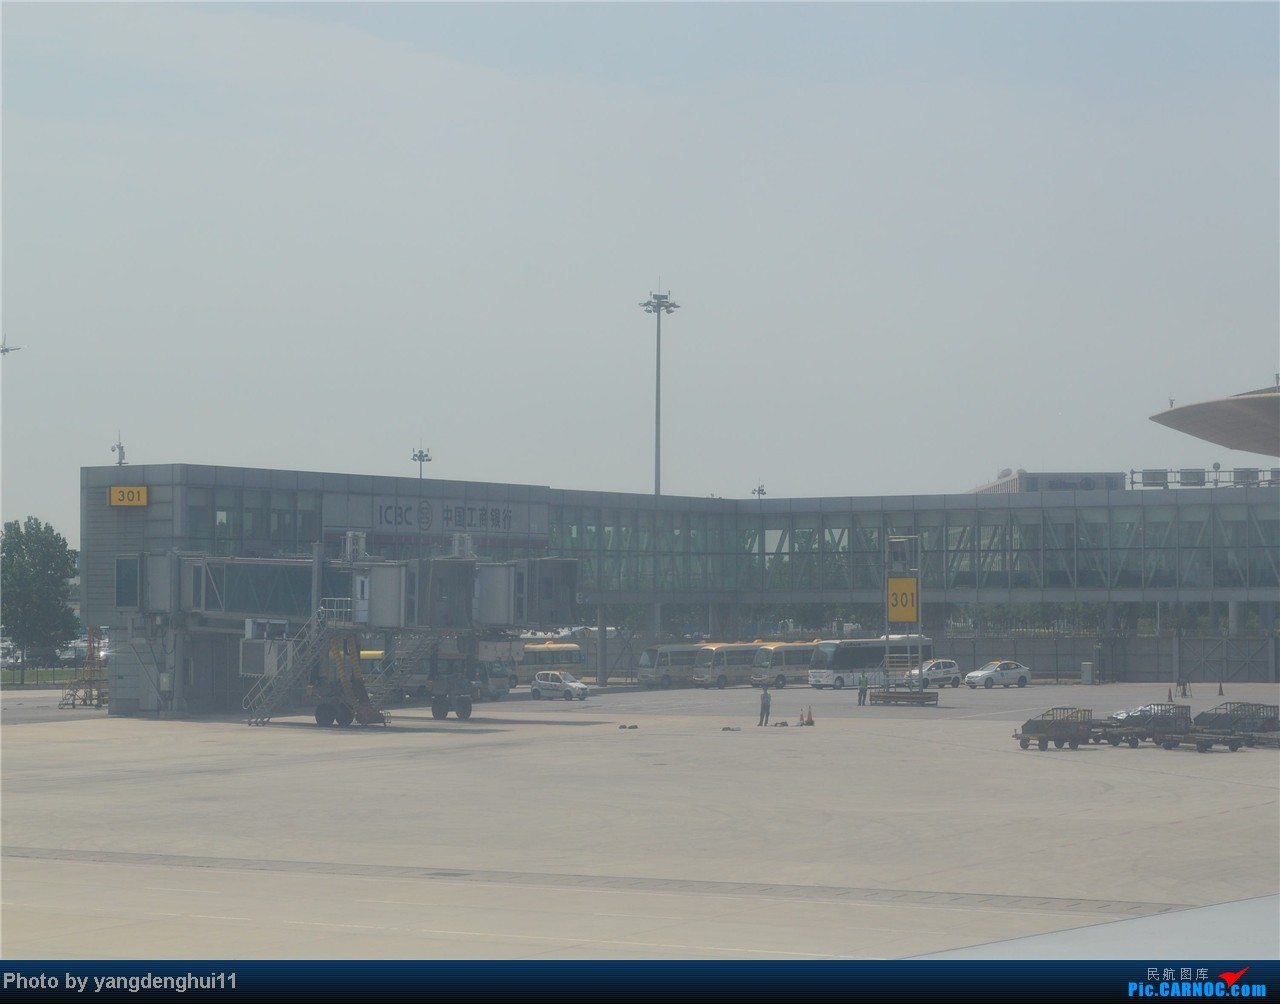 Re:[原创]暑假出游:CTU---PEK---CTU,北京巧遇国航红、蓝凤凰。(上) BOEING 777-200 B-2060 中国北京首都机场 中国北京首都机场